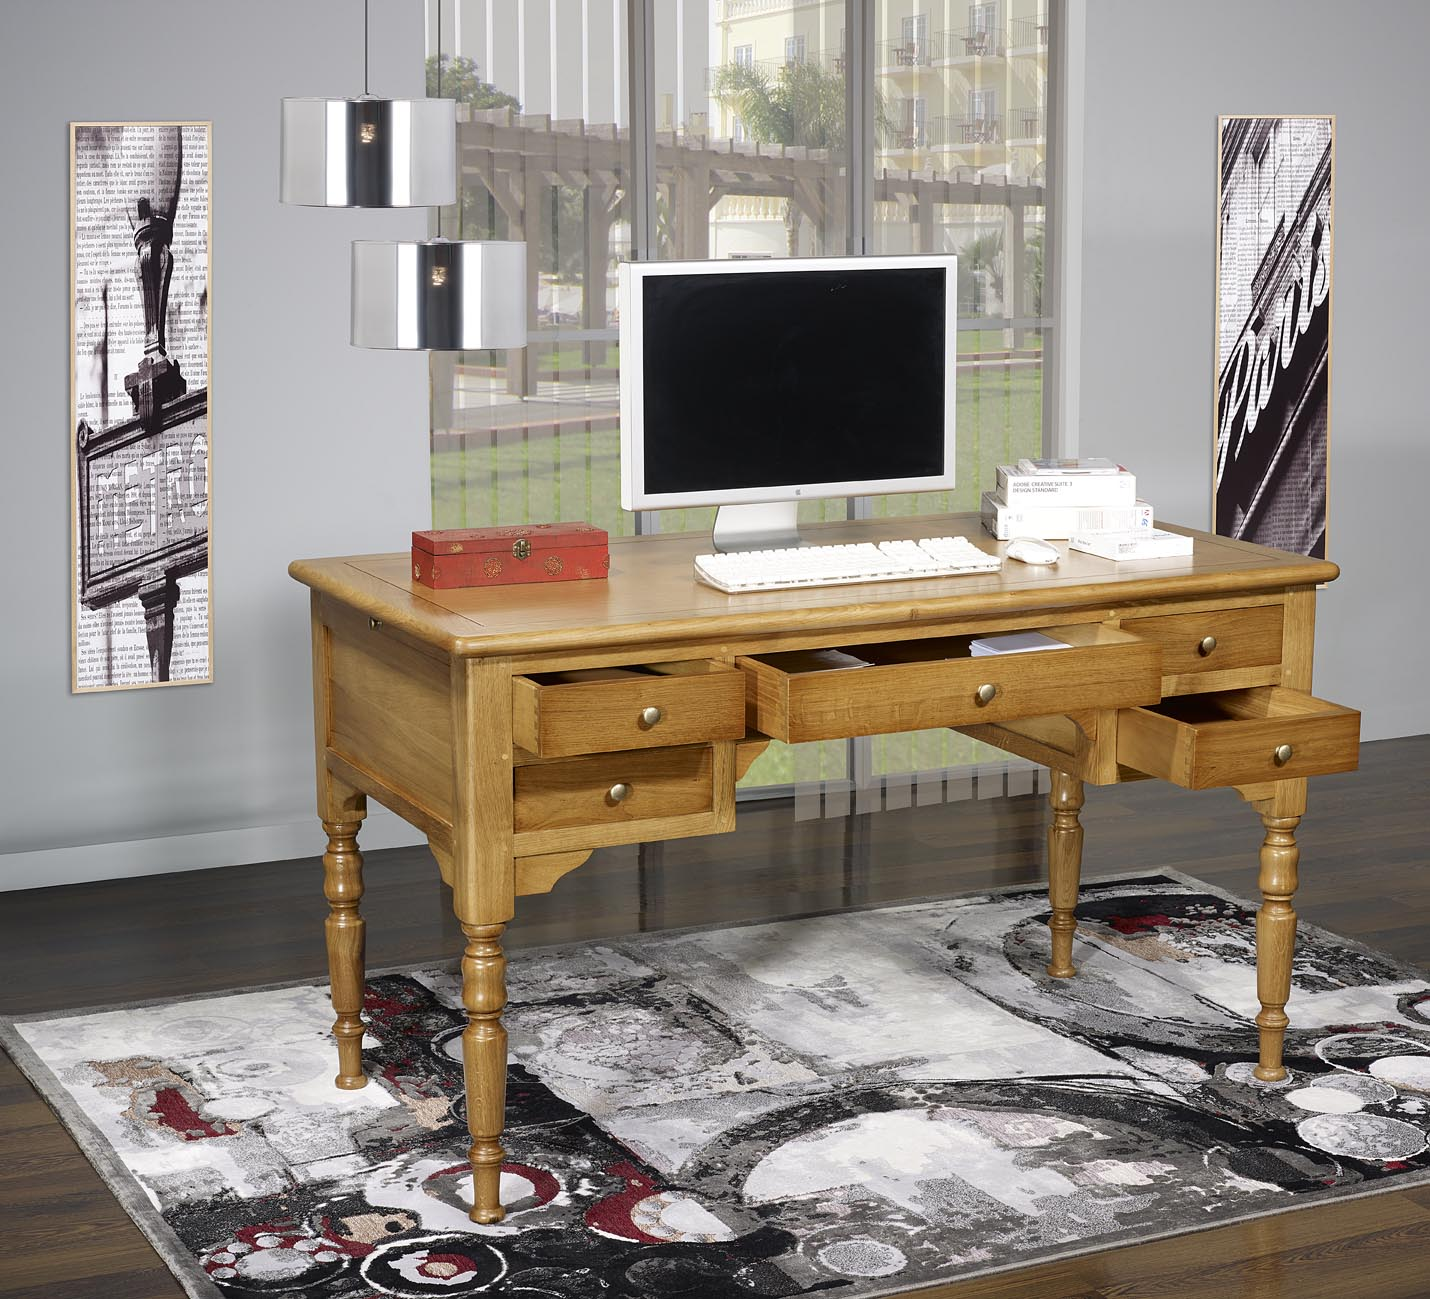 bureau ministre l o en ch ne massif de style louis philippe finition ch ne dor patine. Black Bedroom Furniture Sets. Home Design Ideas